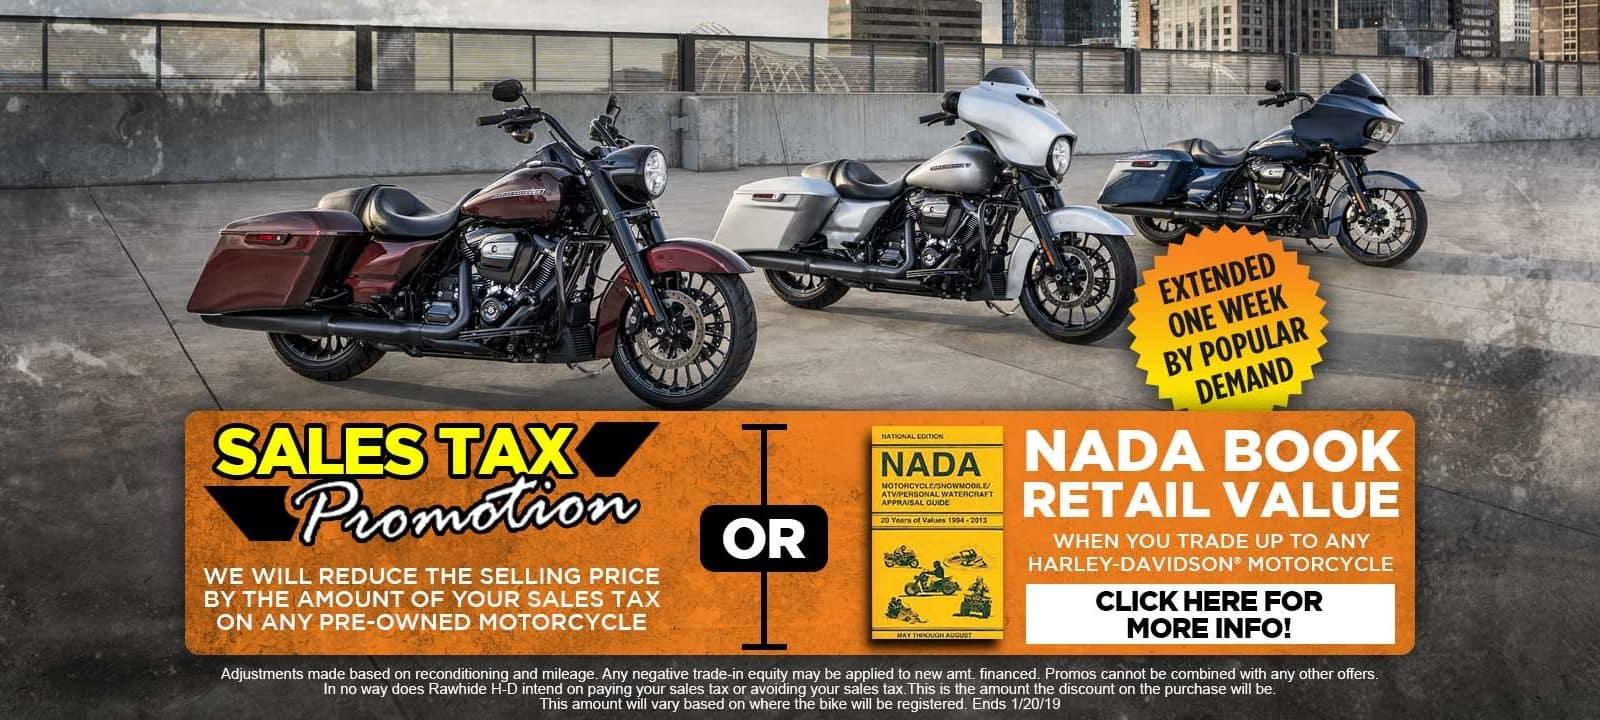 20190114-RHD-1800x720-Sales-Tax-Retail-Trade---Freedom-Promise-Extend